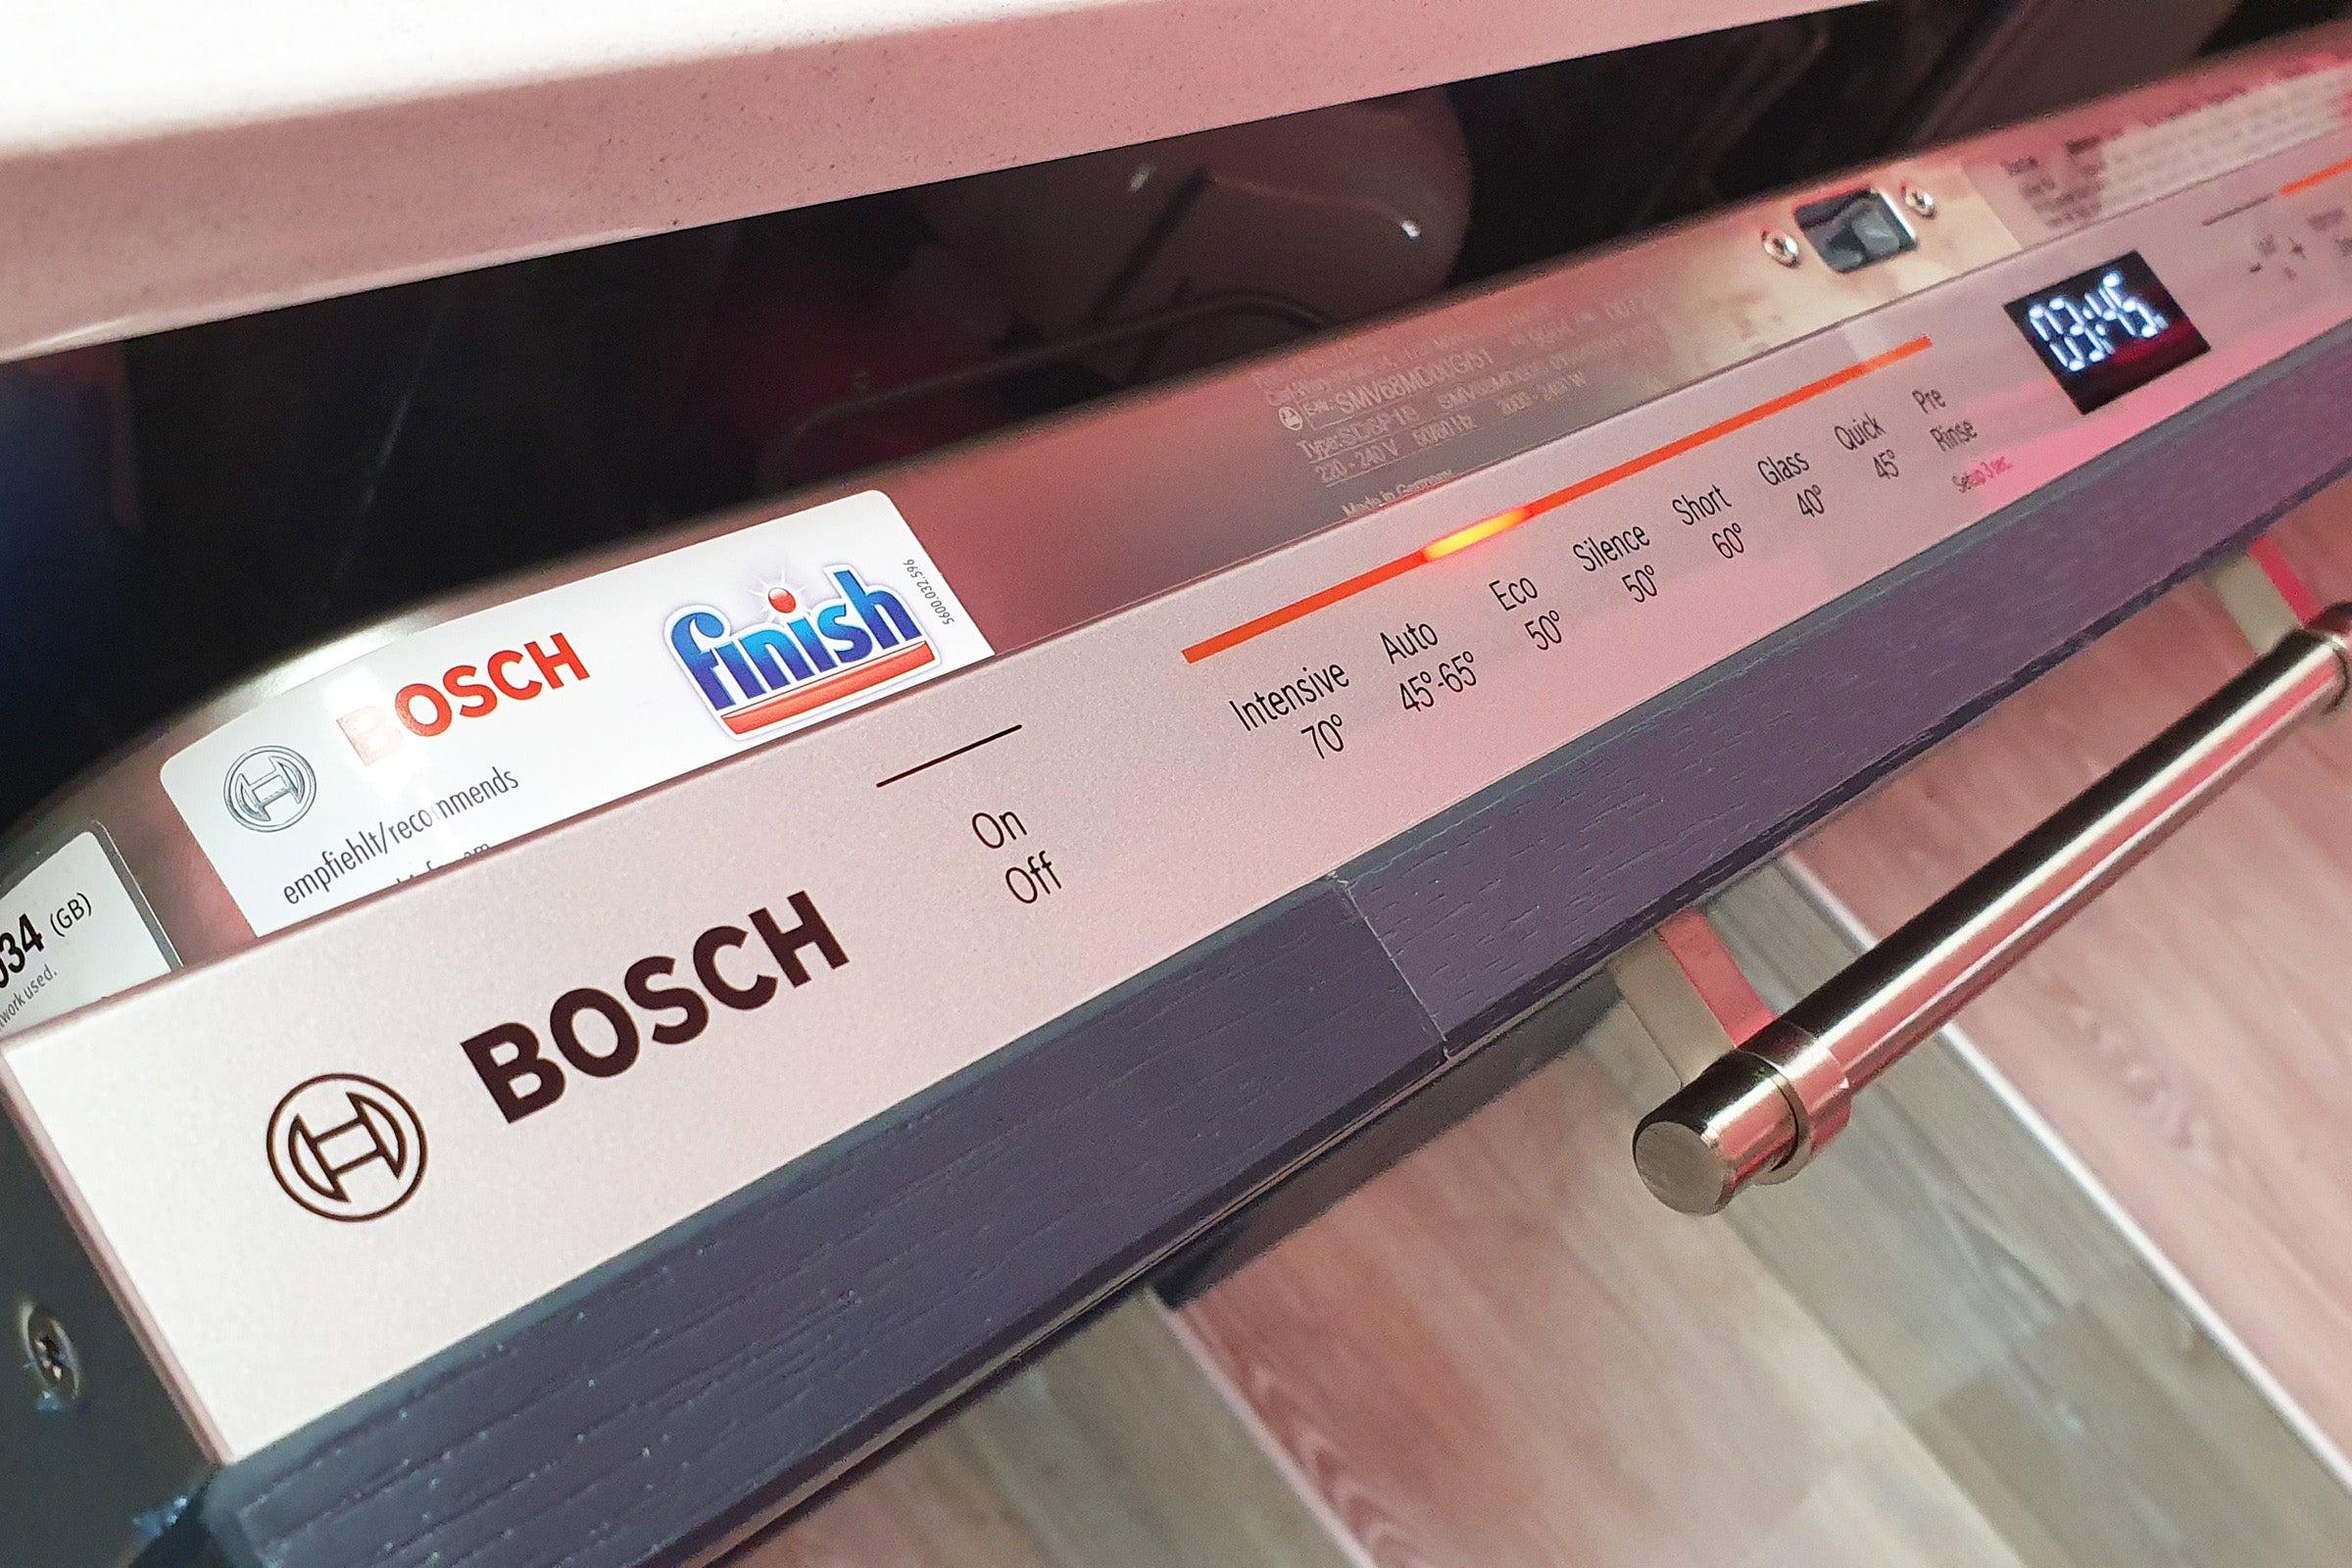 Bosch PerfectDry SMV68MD00G controls